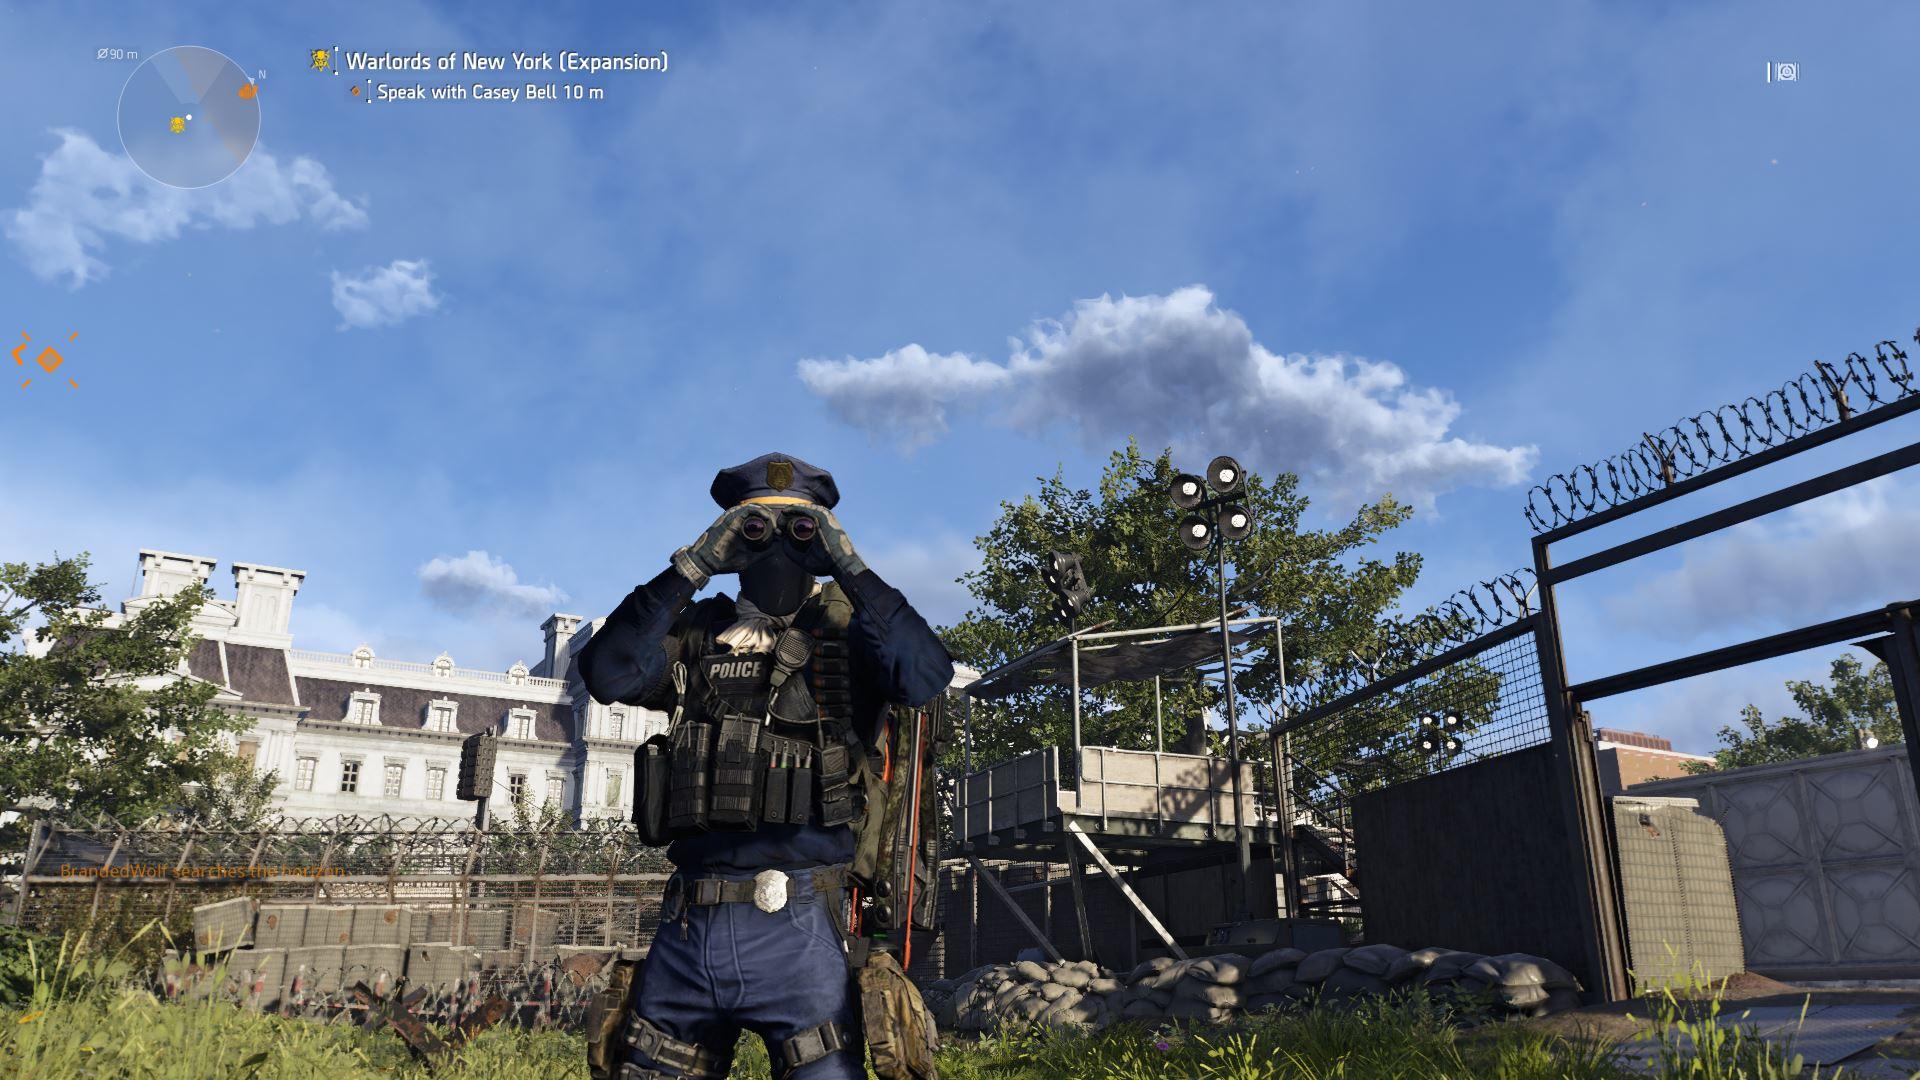 Divizija 2 Warlords of New York Pregled za PC 1